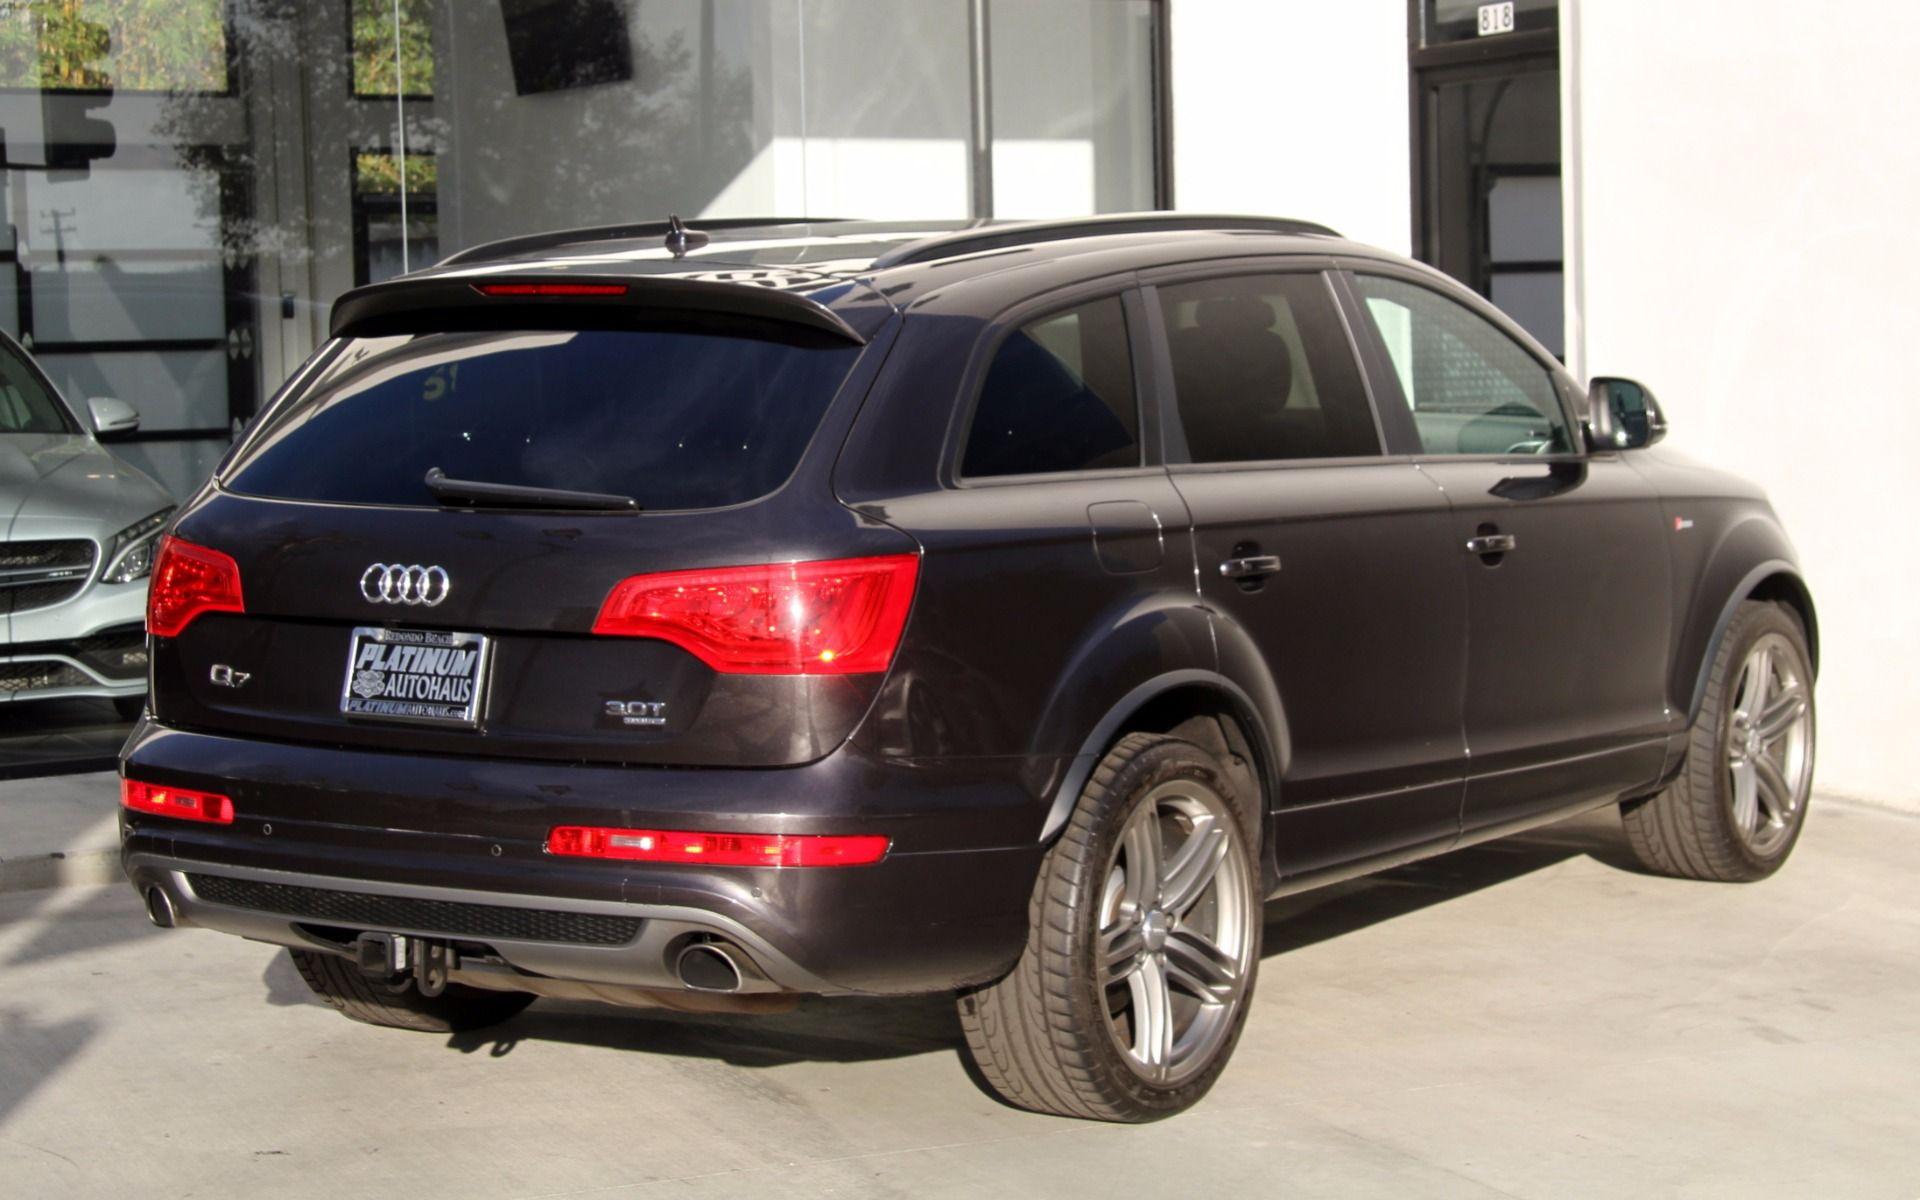 Audi Dealership Near Me >> Audi Dealer Near Me 2014 Audi Qt S Line Prestige Stock 6010 For